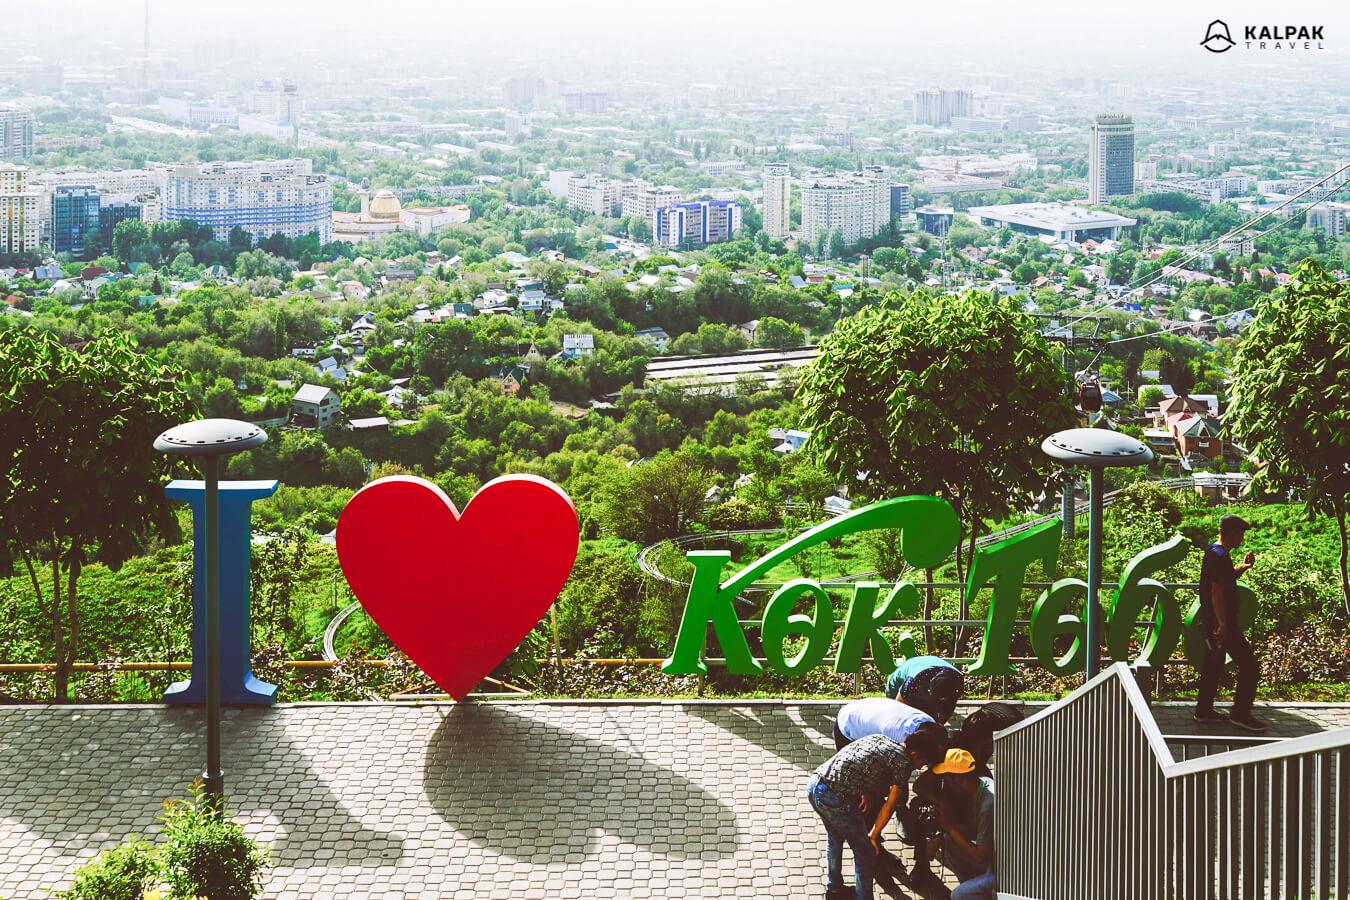 Kok Tobe view in Almaty